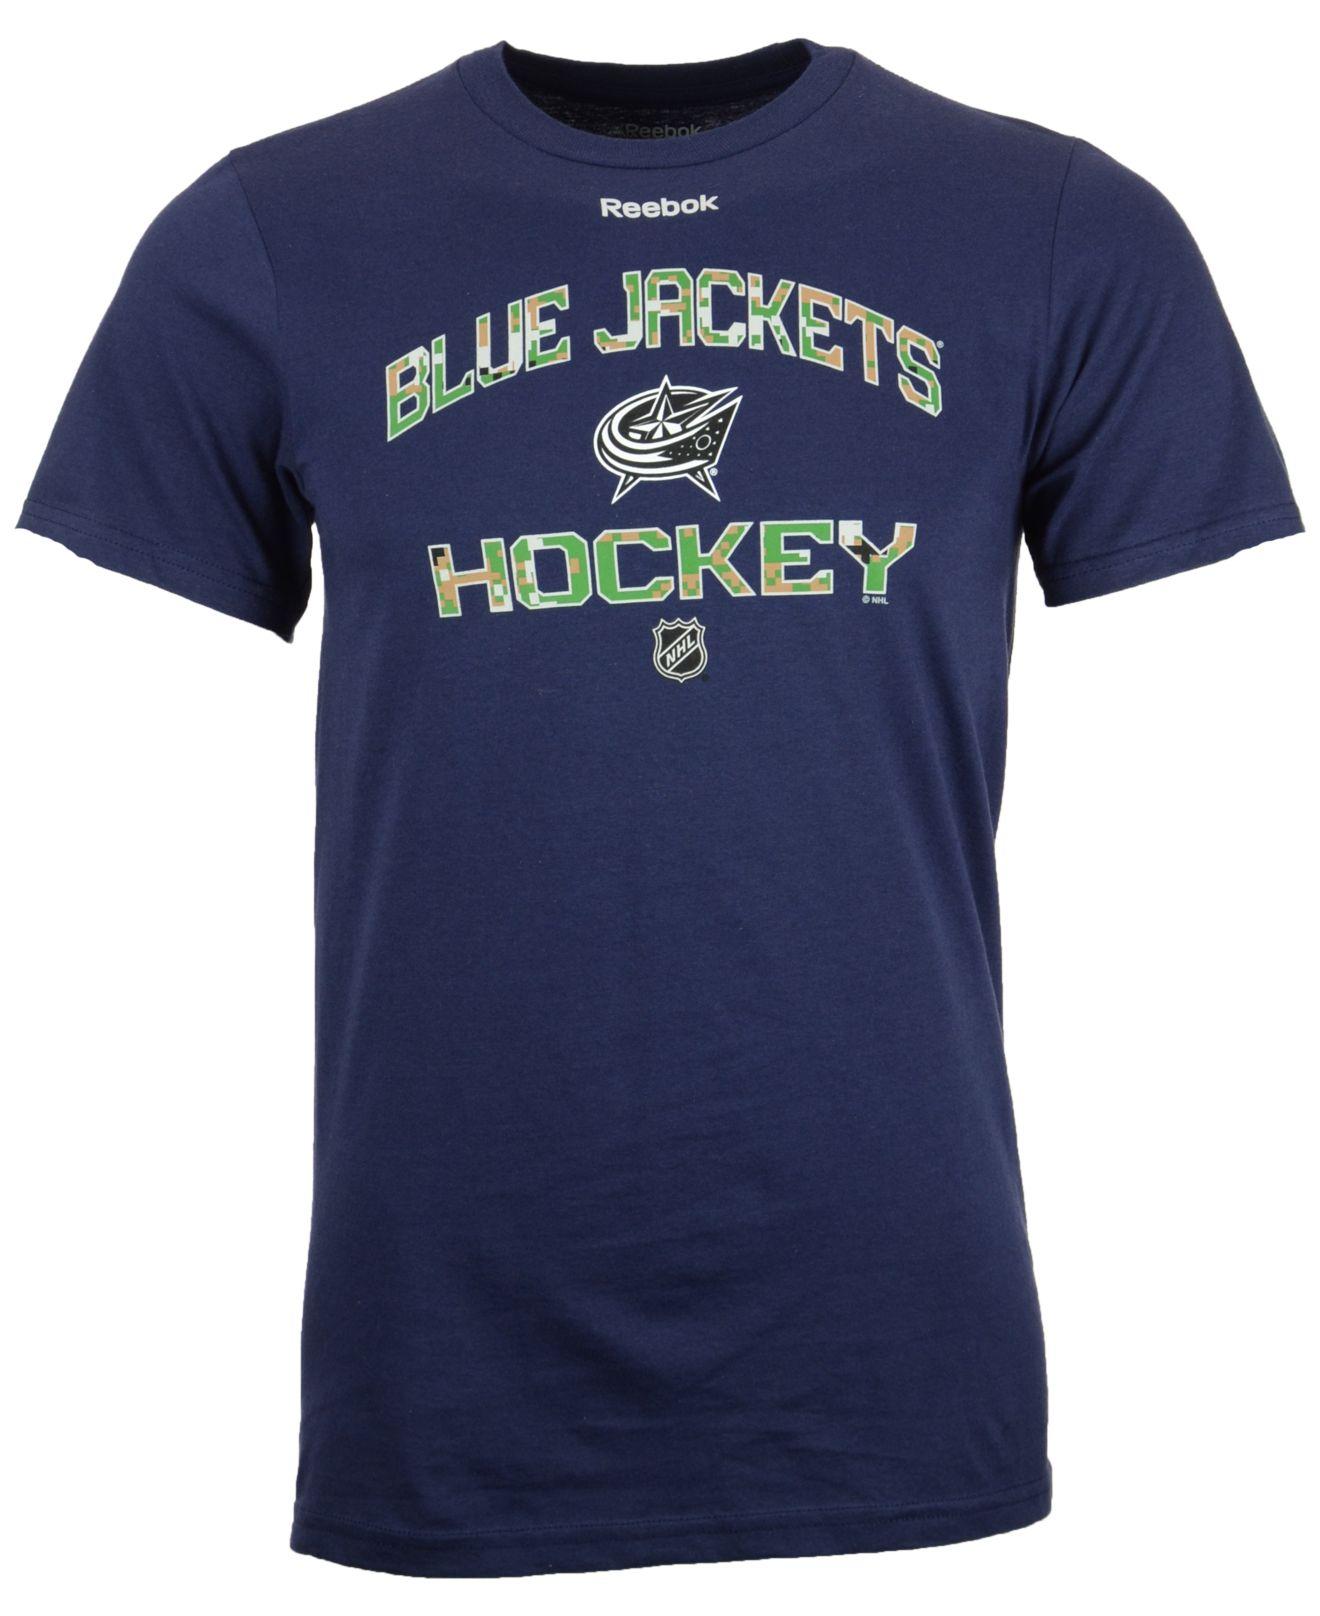 Reebok men 39 s short sleeve columbus blue jackets camo for Columbus ohio t shirt printing